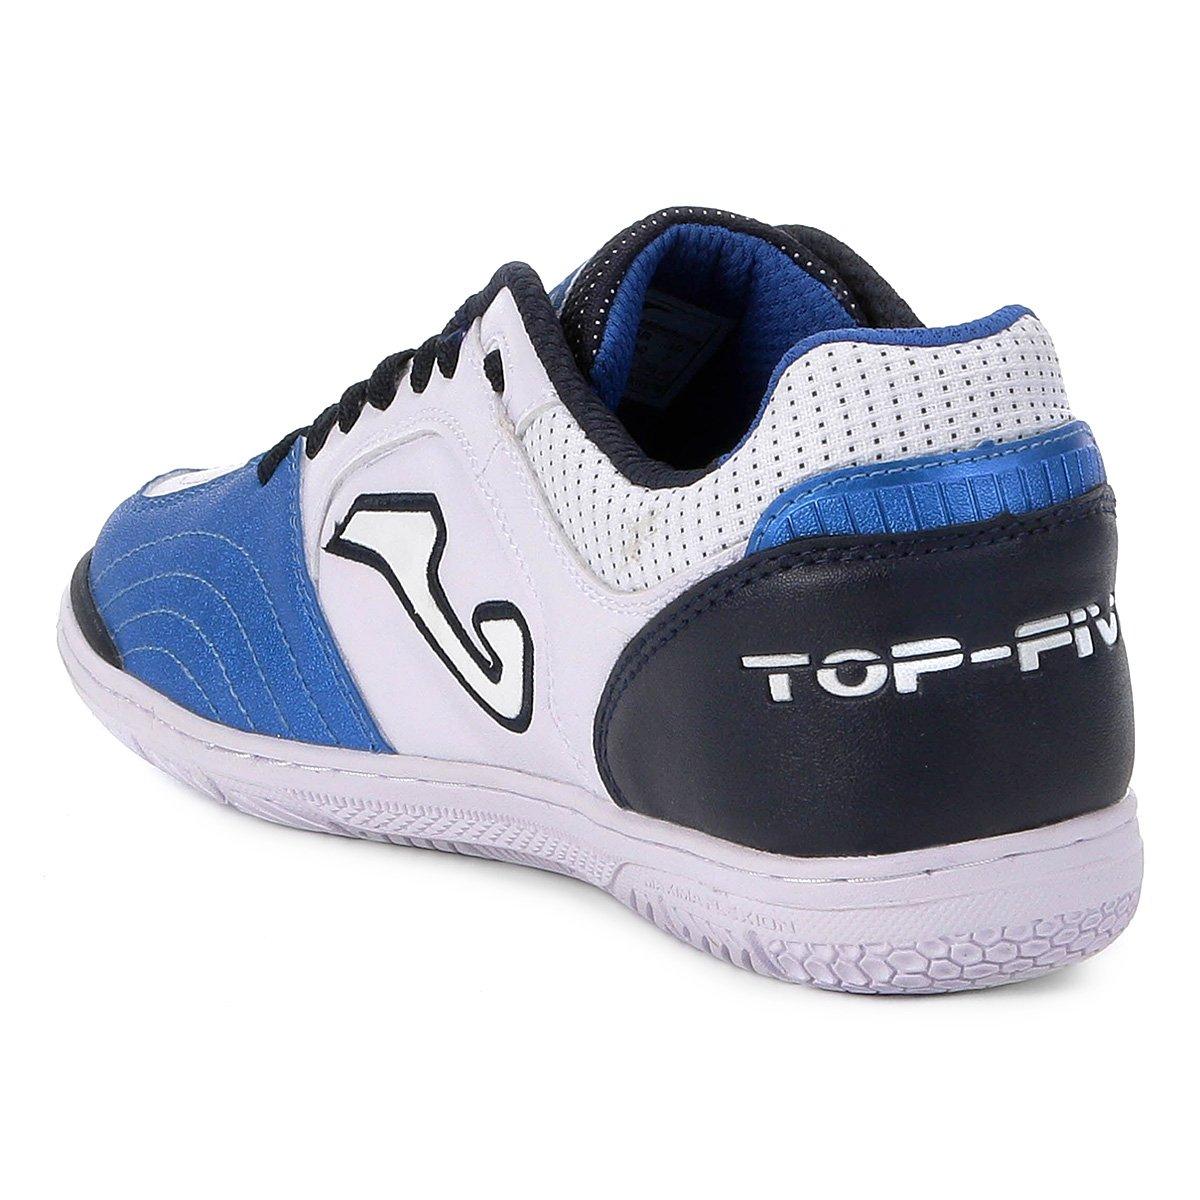 e1a5847dd5 Chuteira Futsal Joma Top Five IN - Branco - Compre Agora